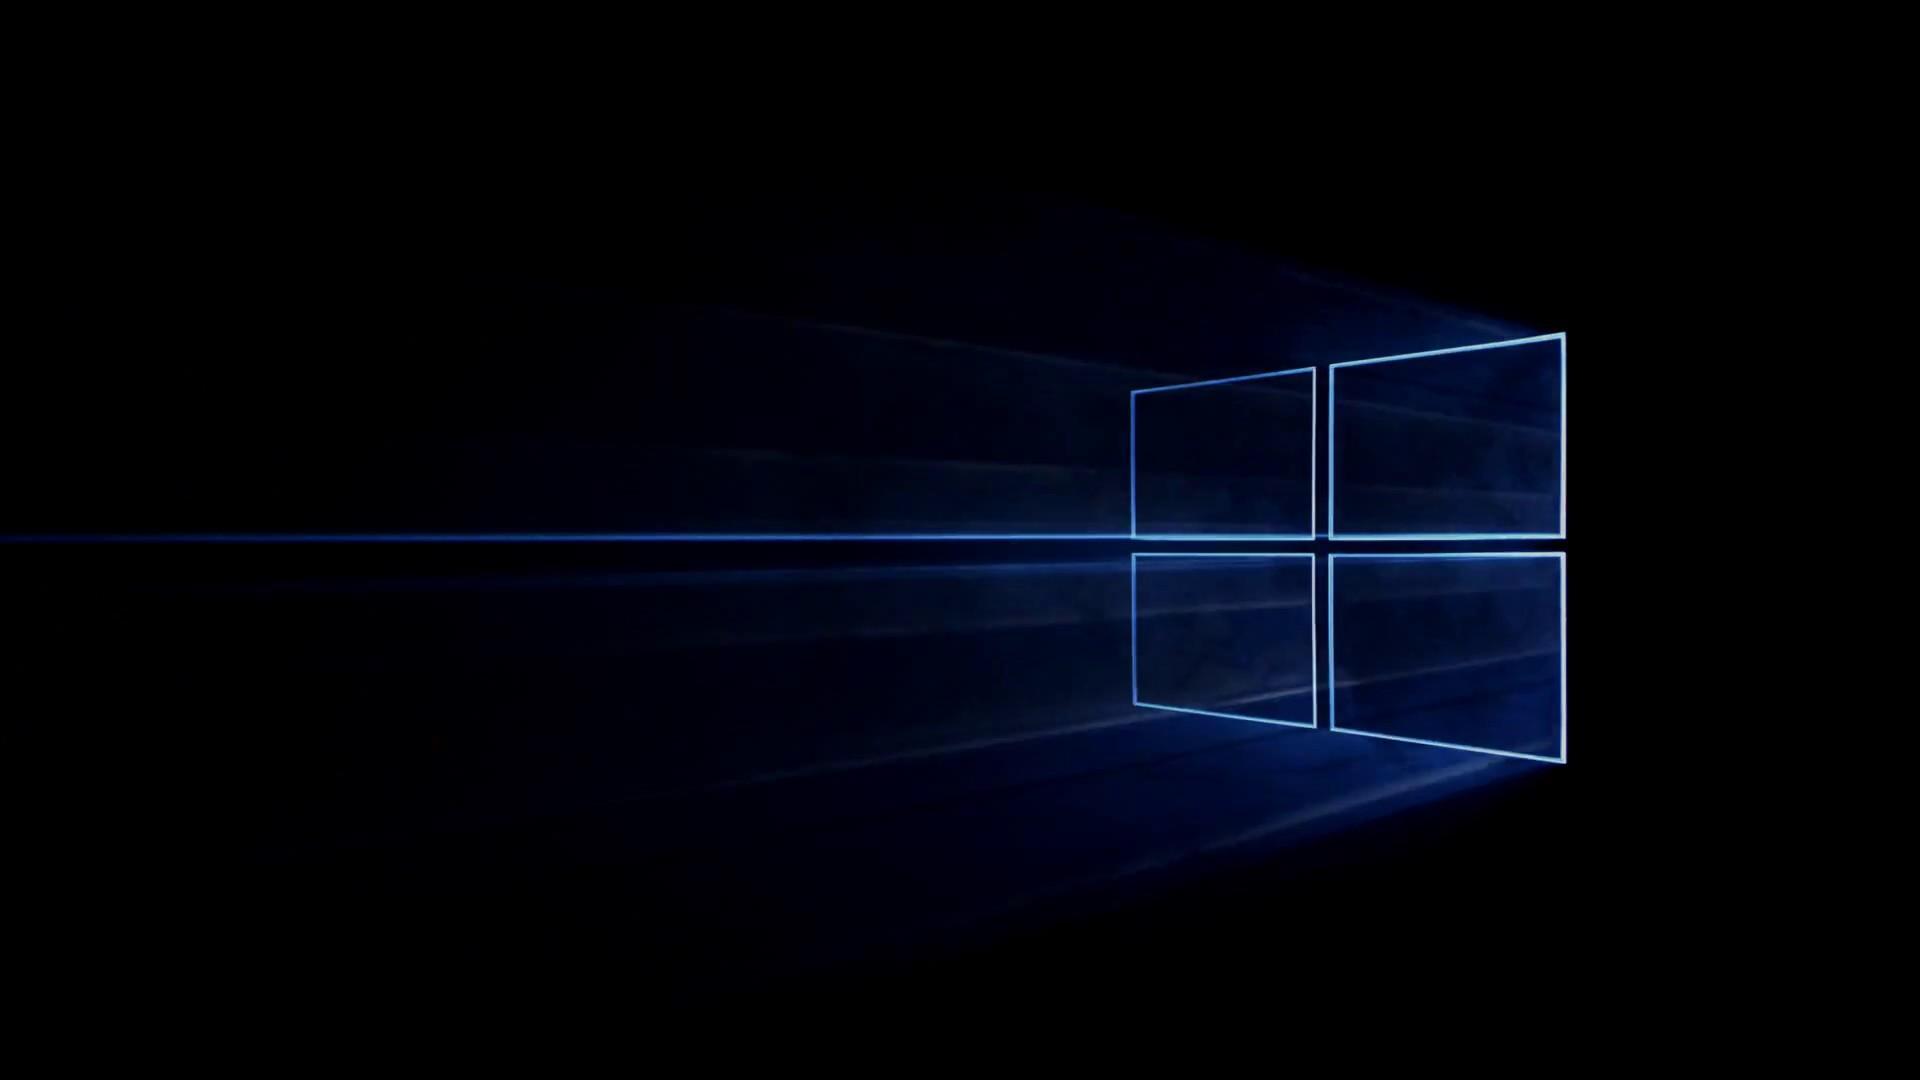 How To Add Desktop Clipart Windows 10.